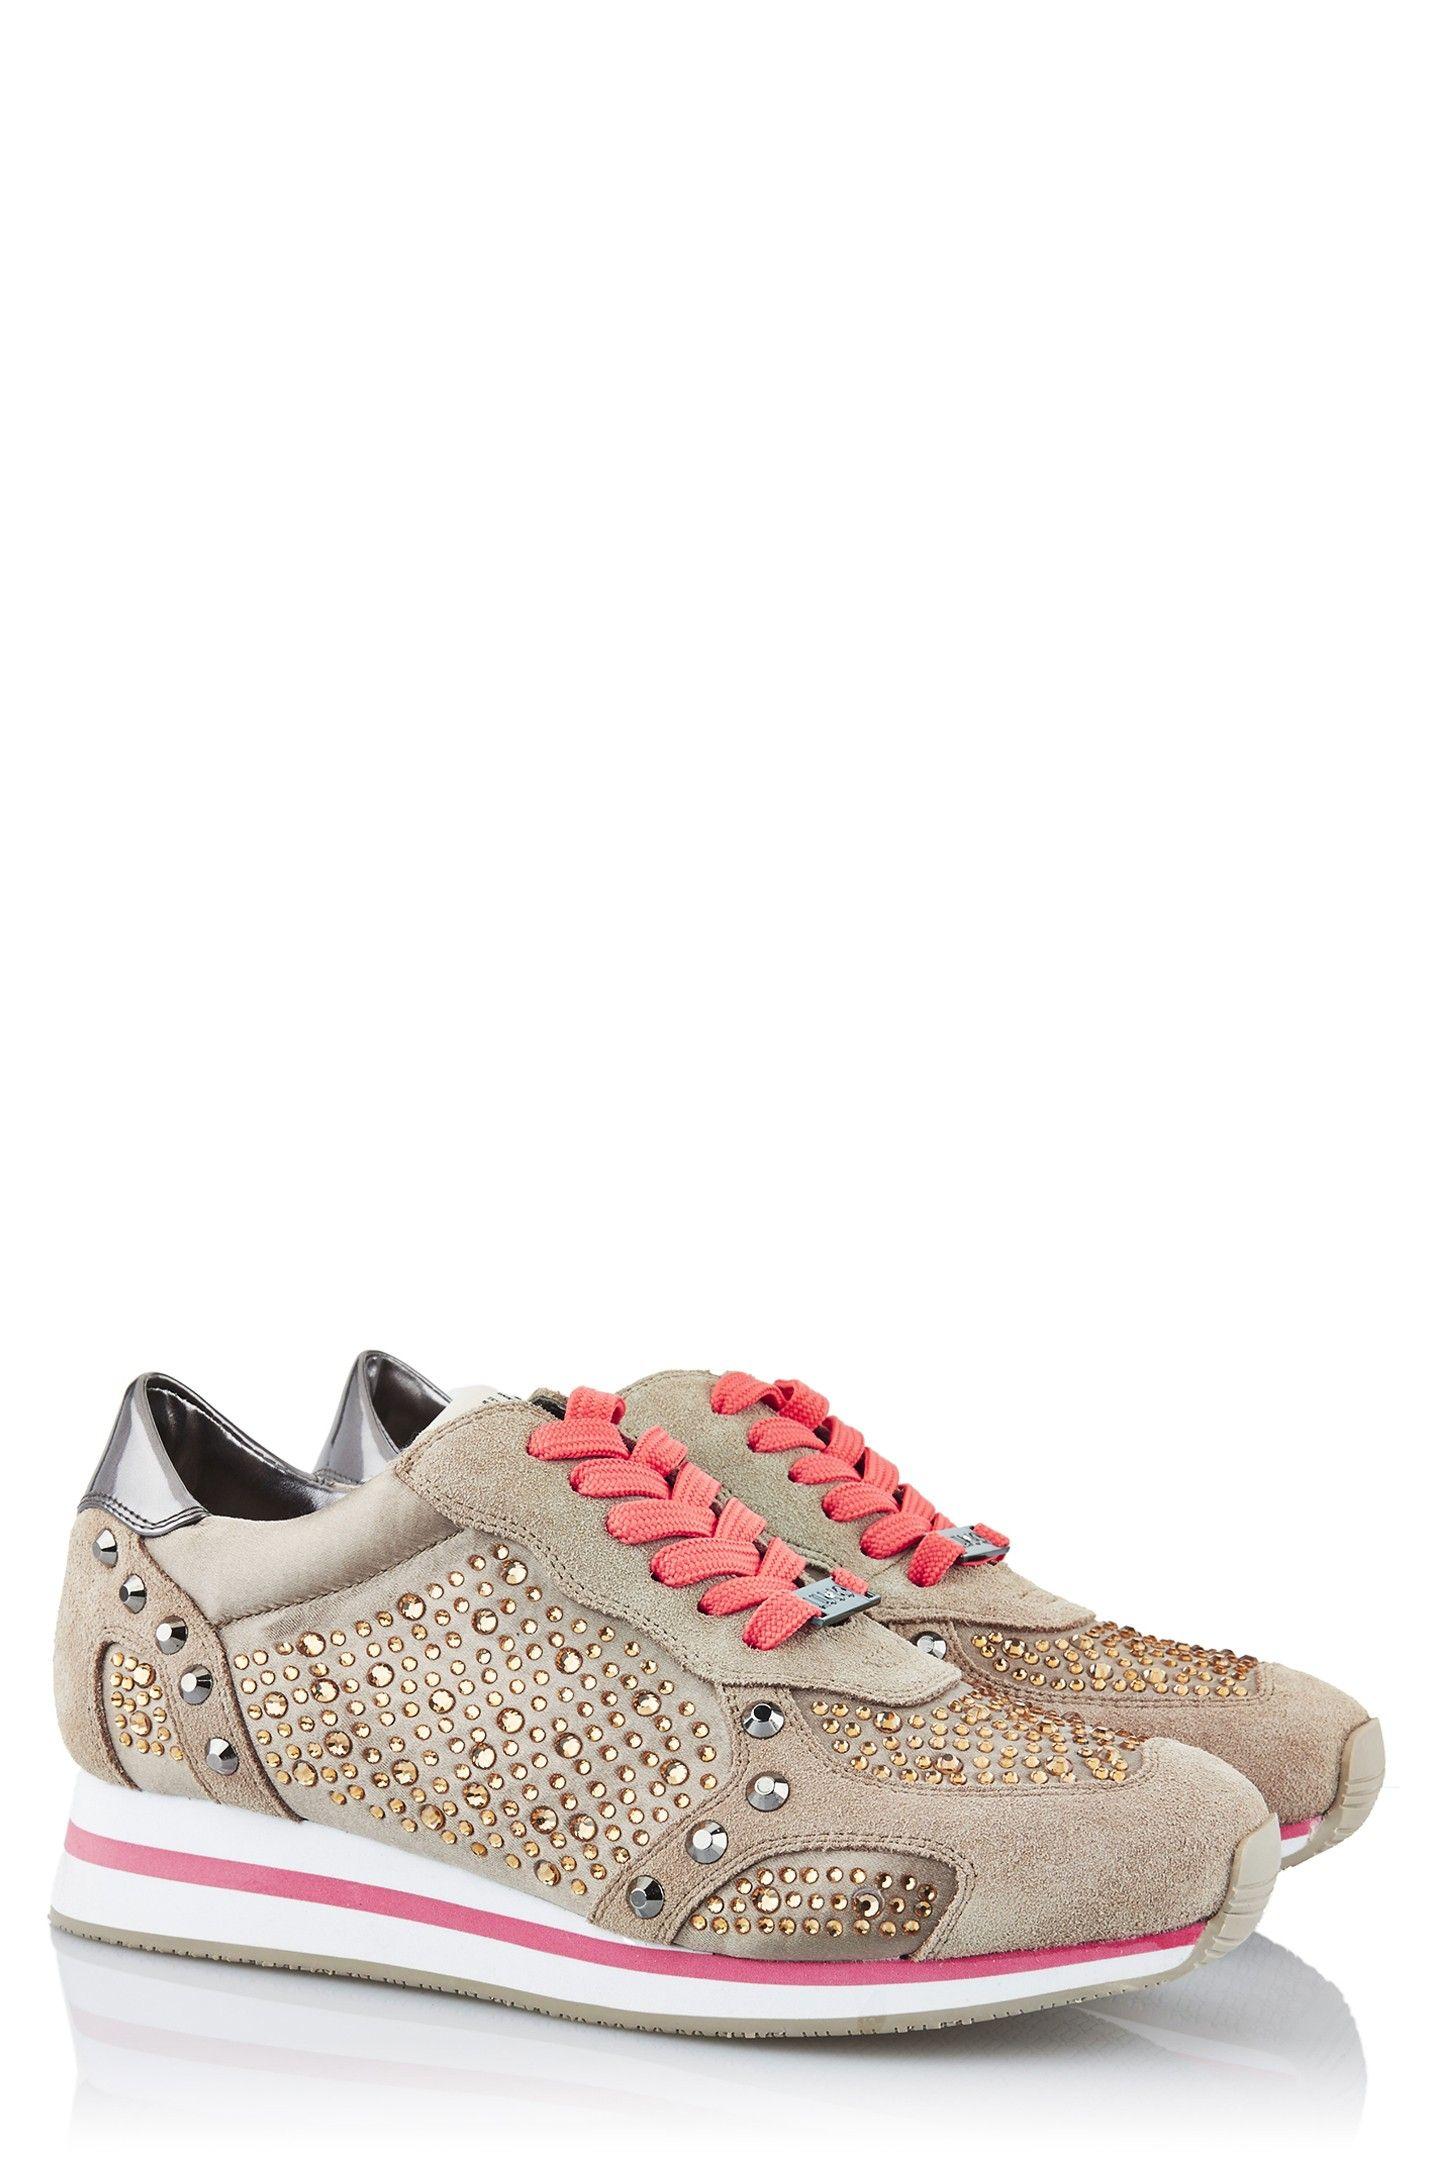 Chaussures - Bas-tops Et Chaussures De Sport Aiment Moschino 5sYYxp